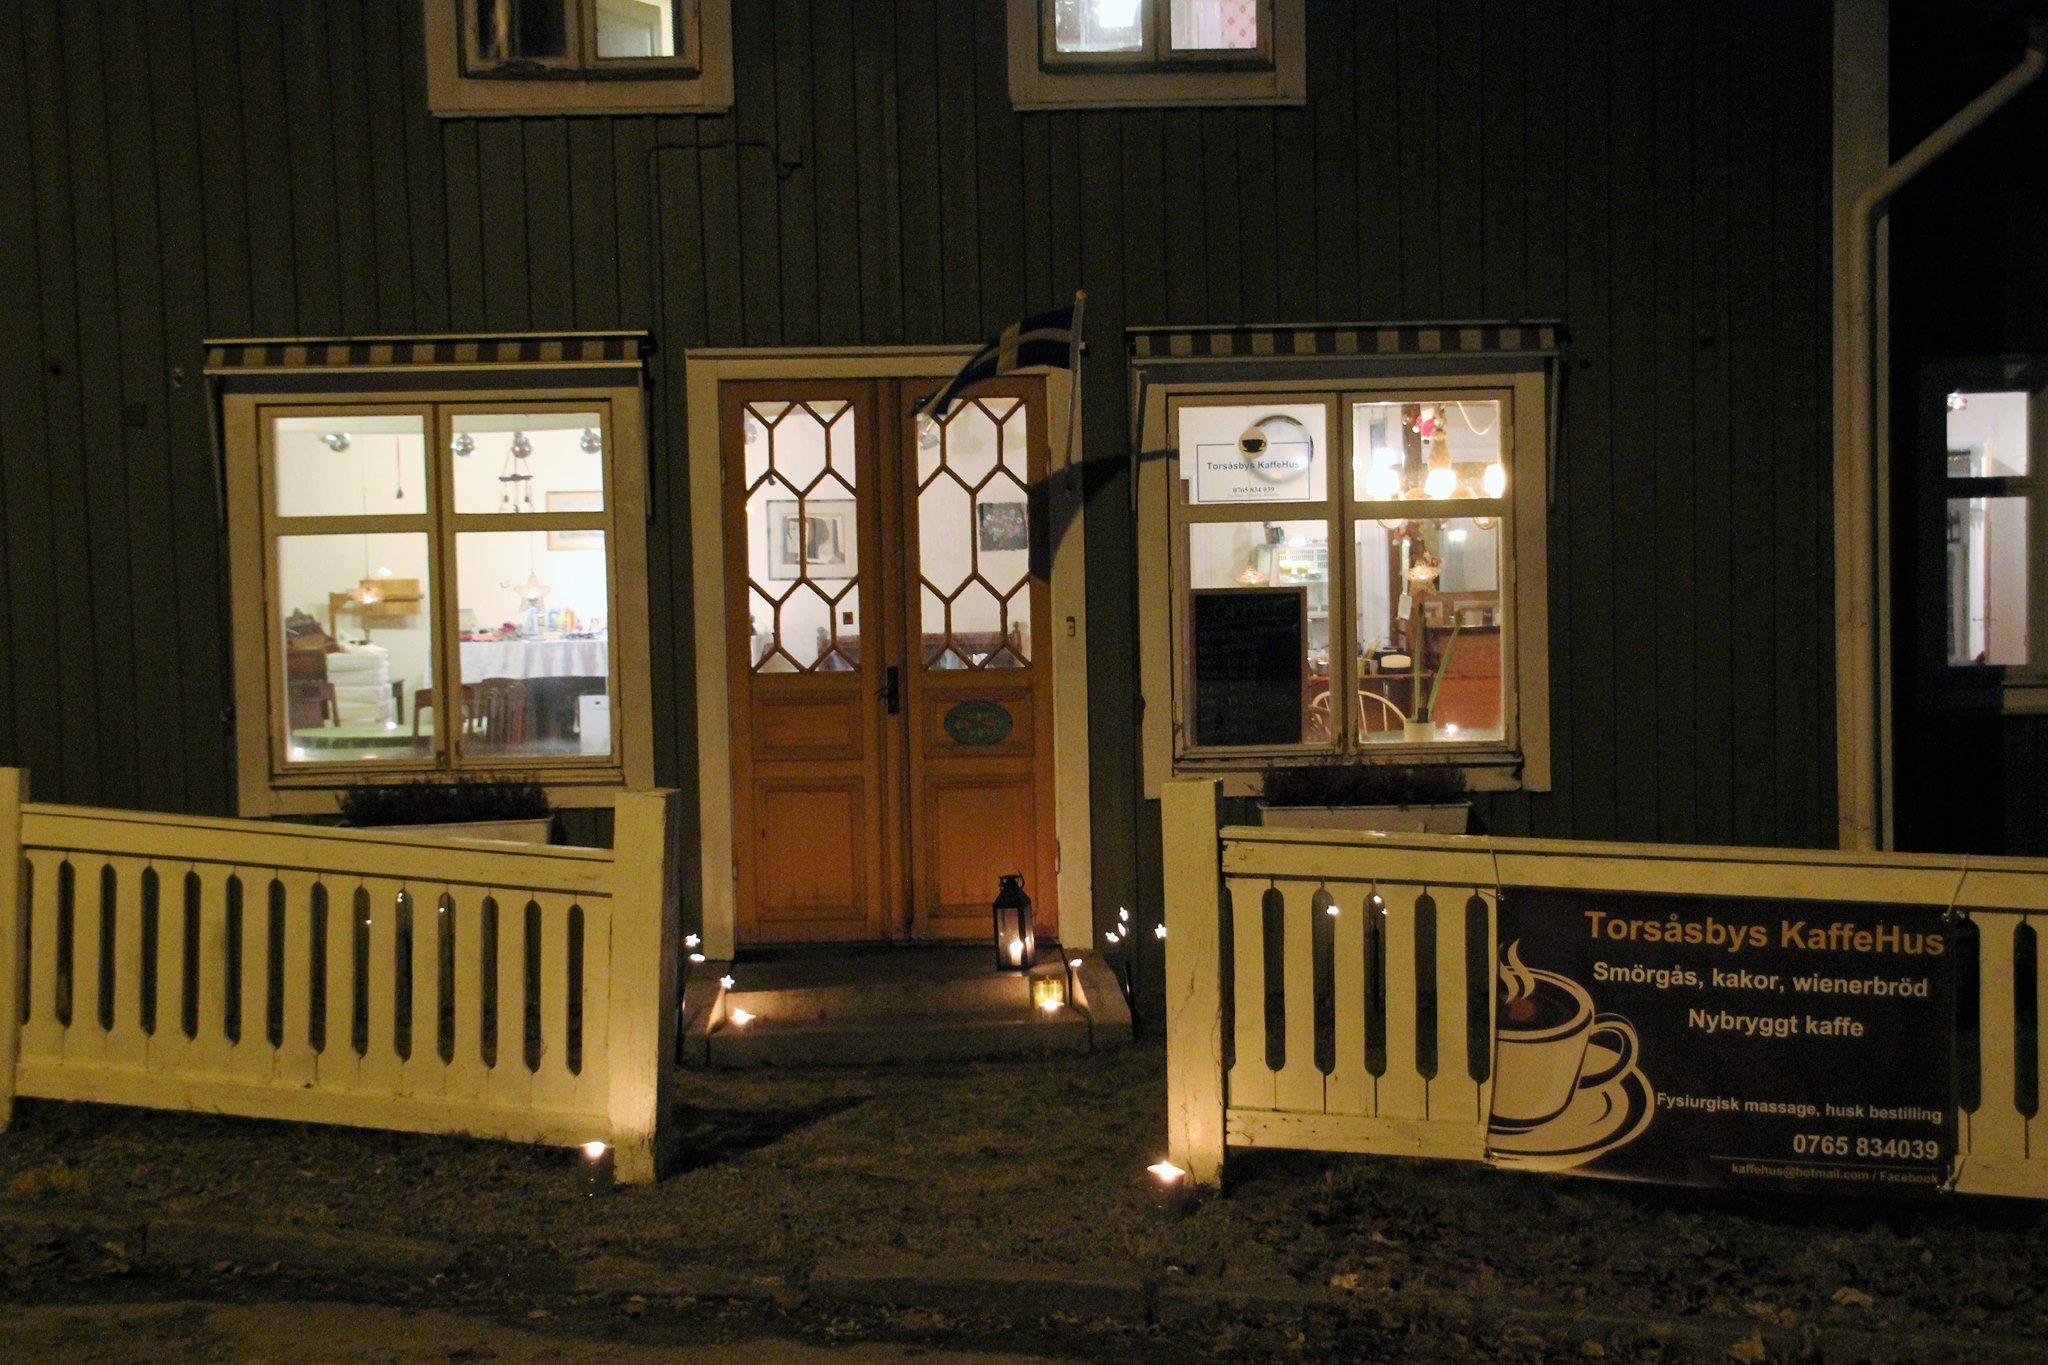 Torsåsby KaffeHus